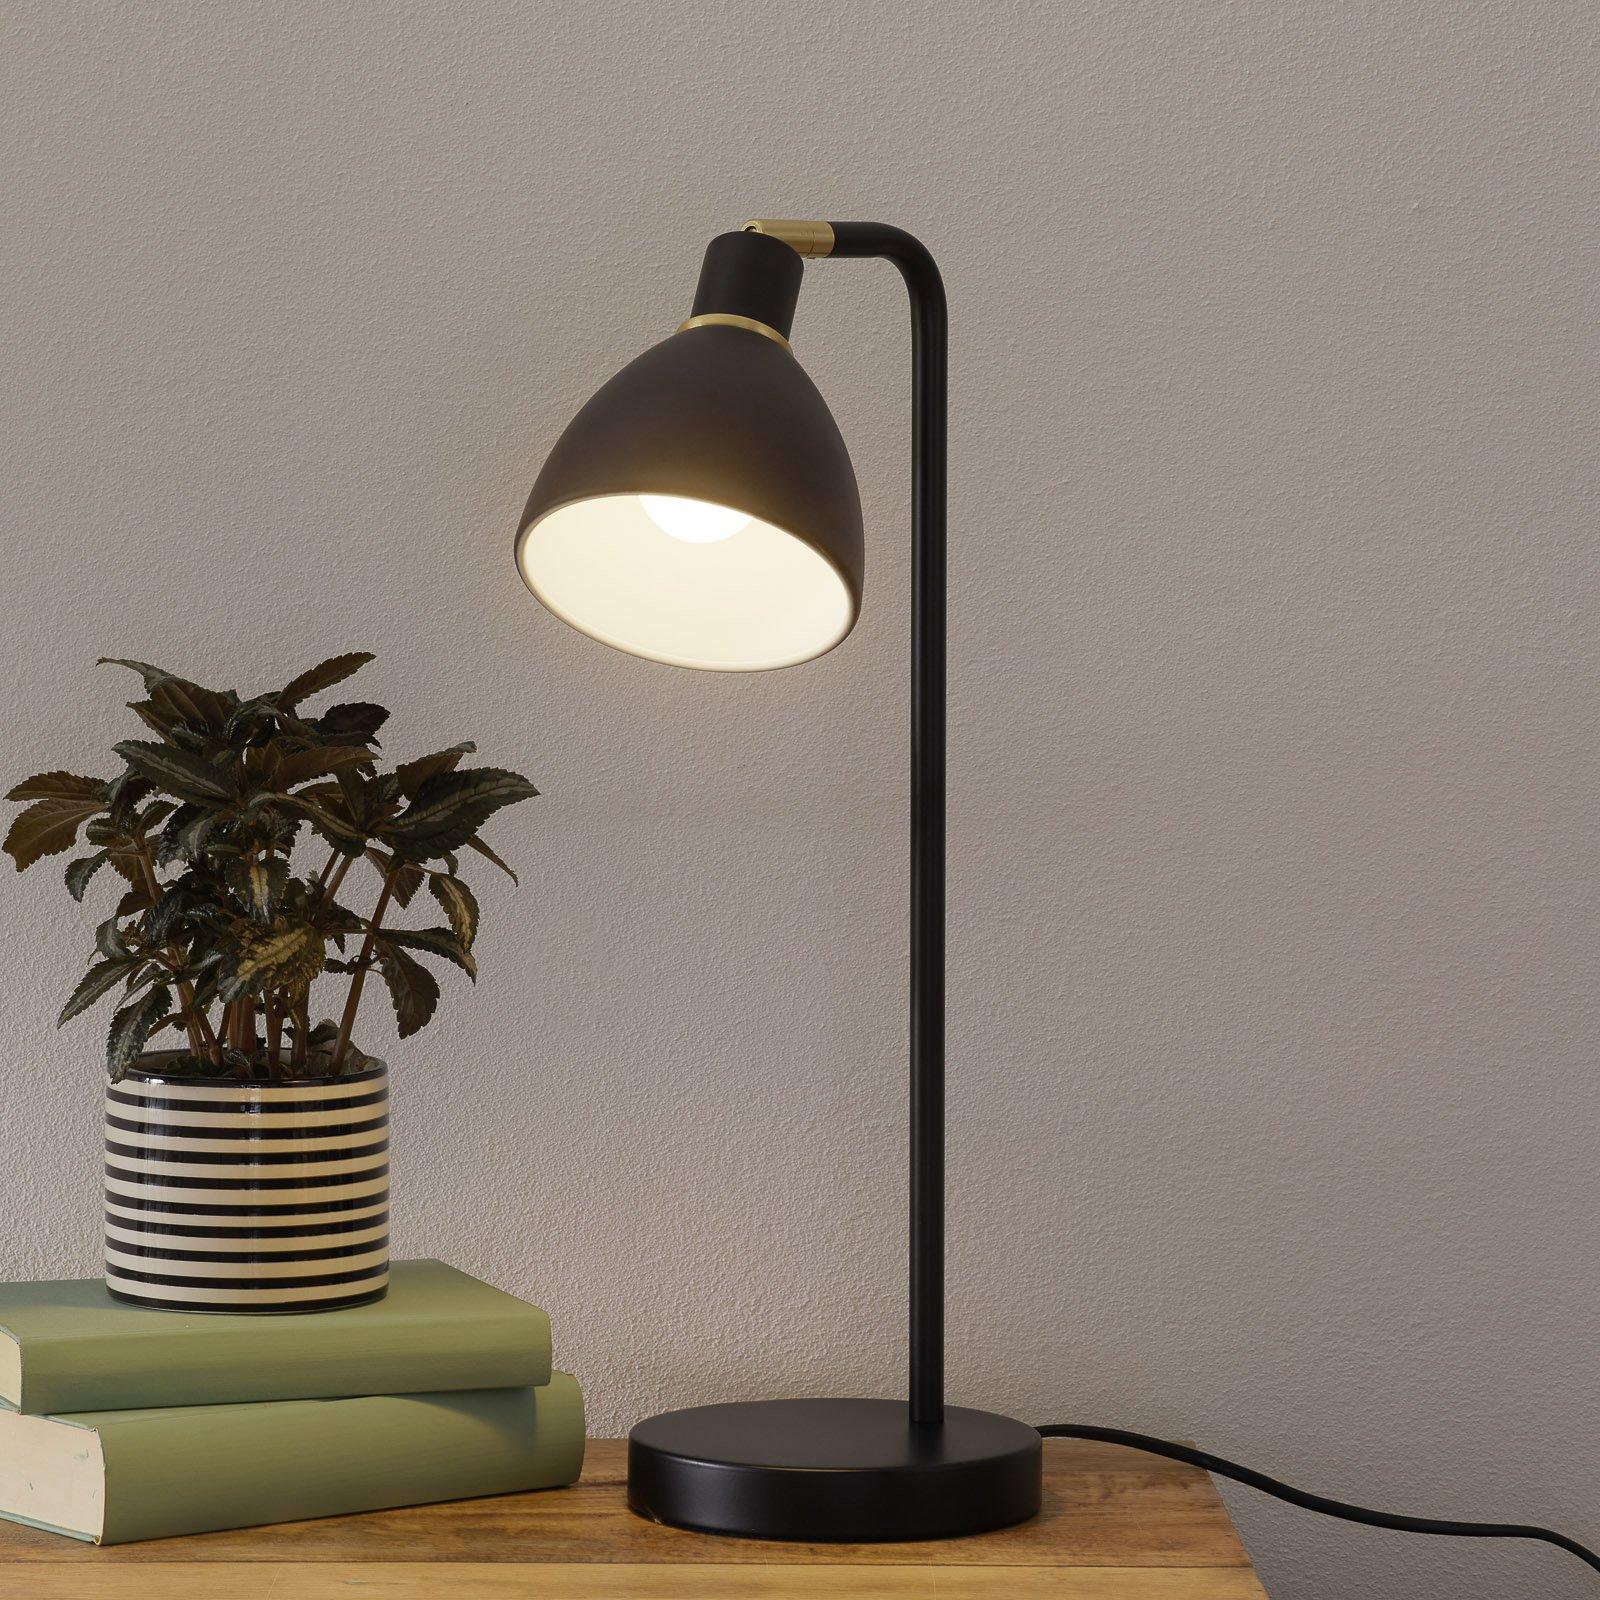 Tidløs bordlampe Ray for skrivebordet